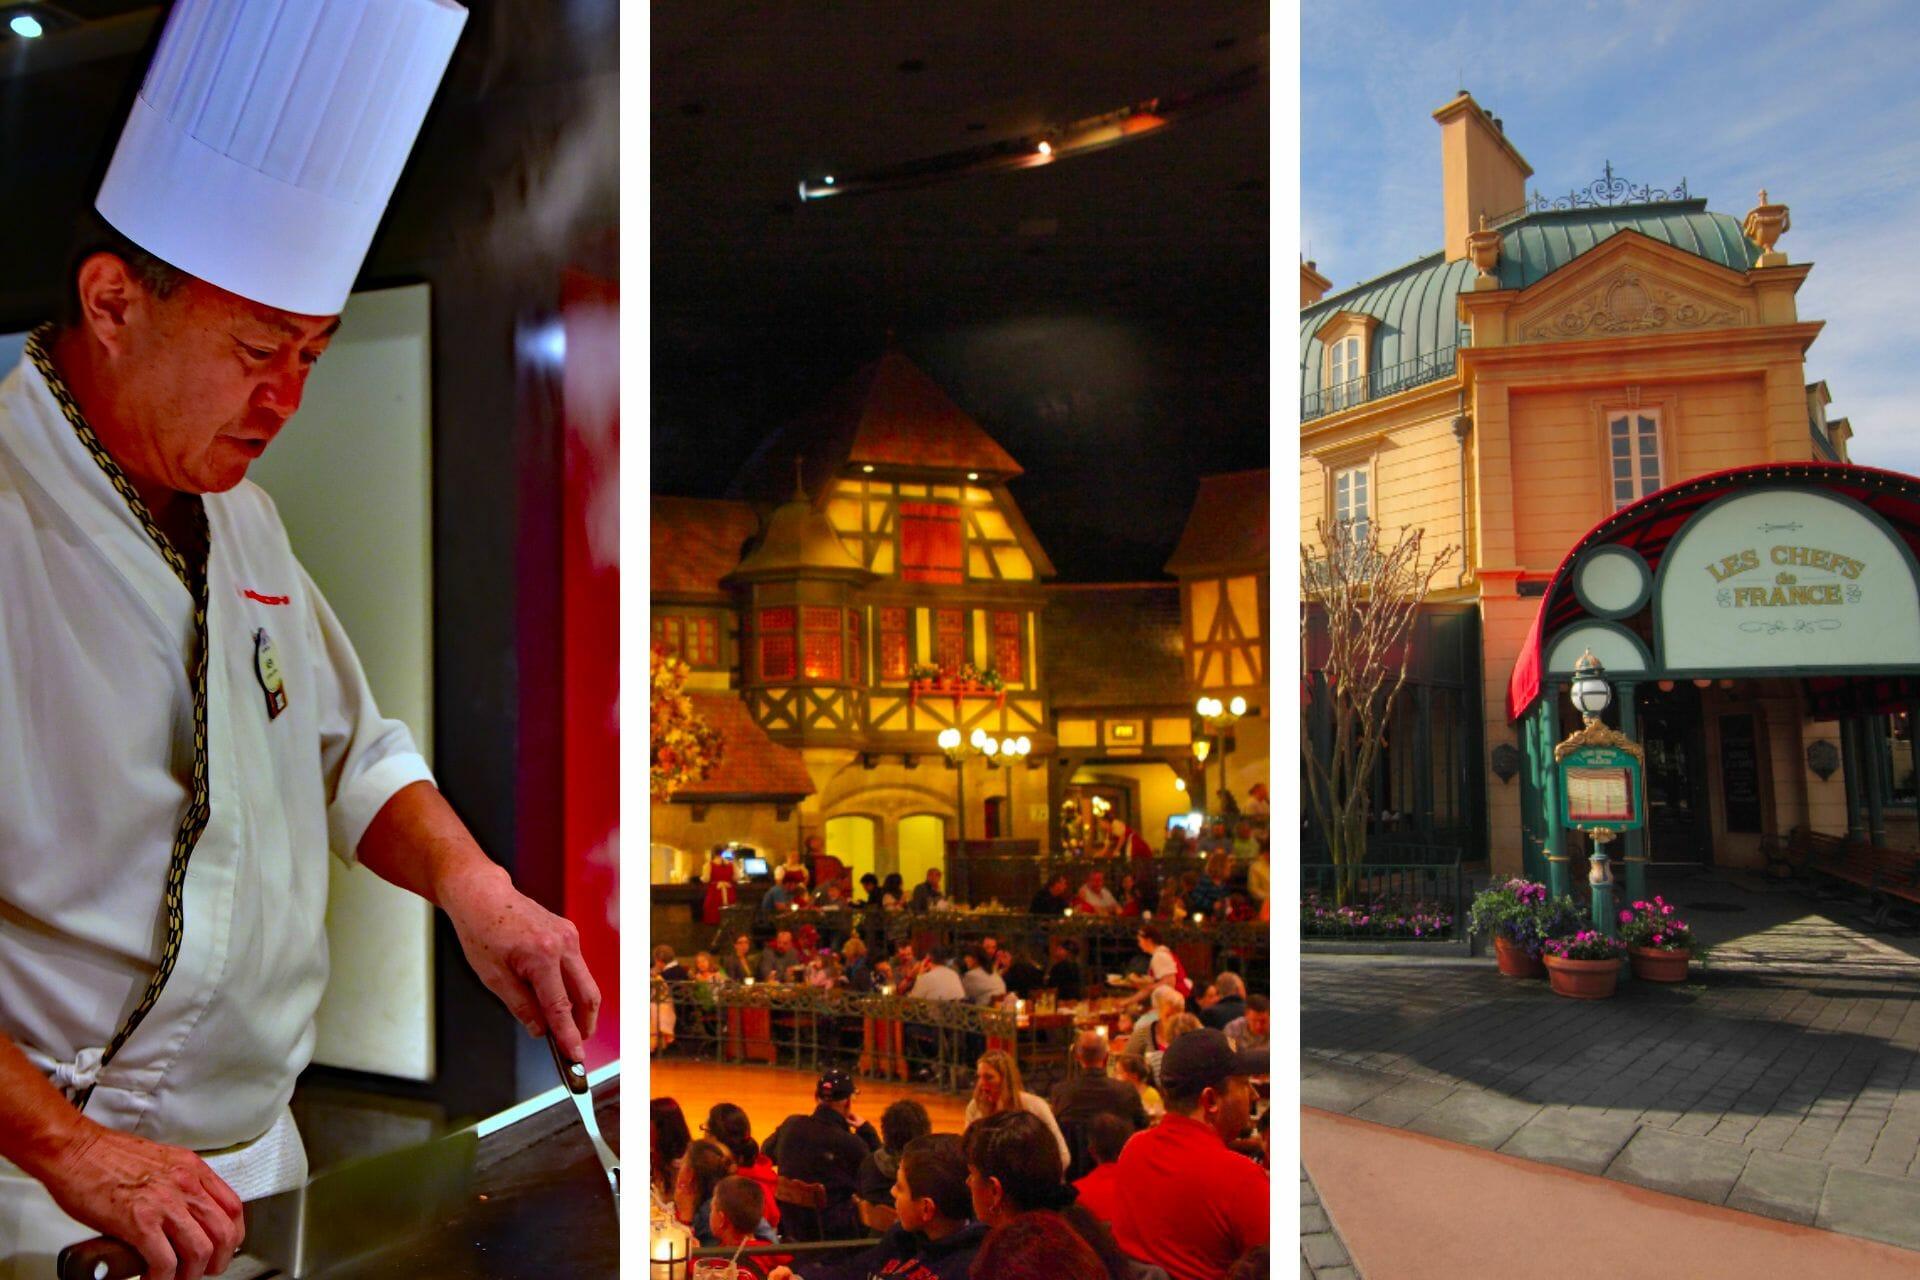 11 Best Epcot Restaurants (ranked honestly) via @allamericanatlas